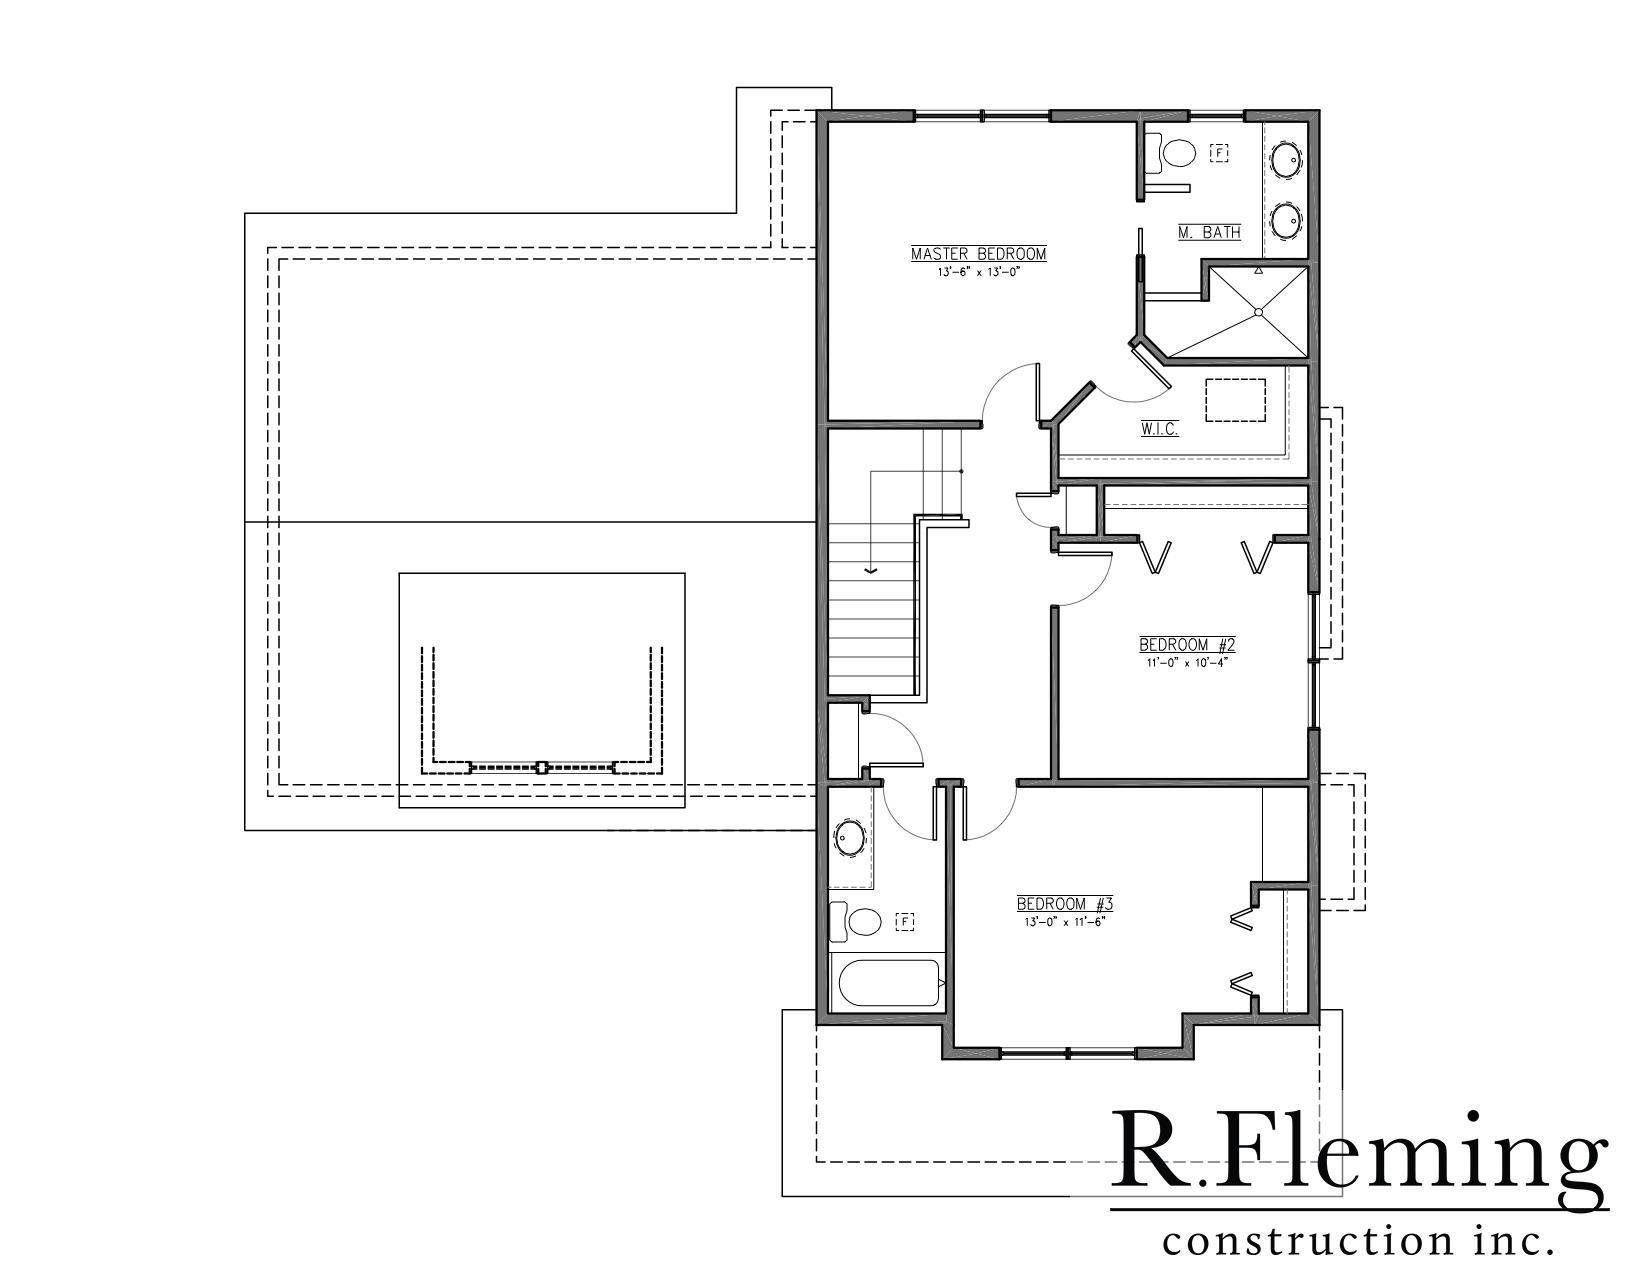 Kumar 2 story r fleming construction r fleming for Fleming homes floor plans